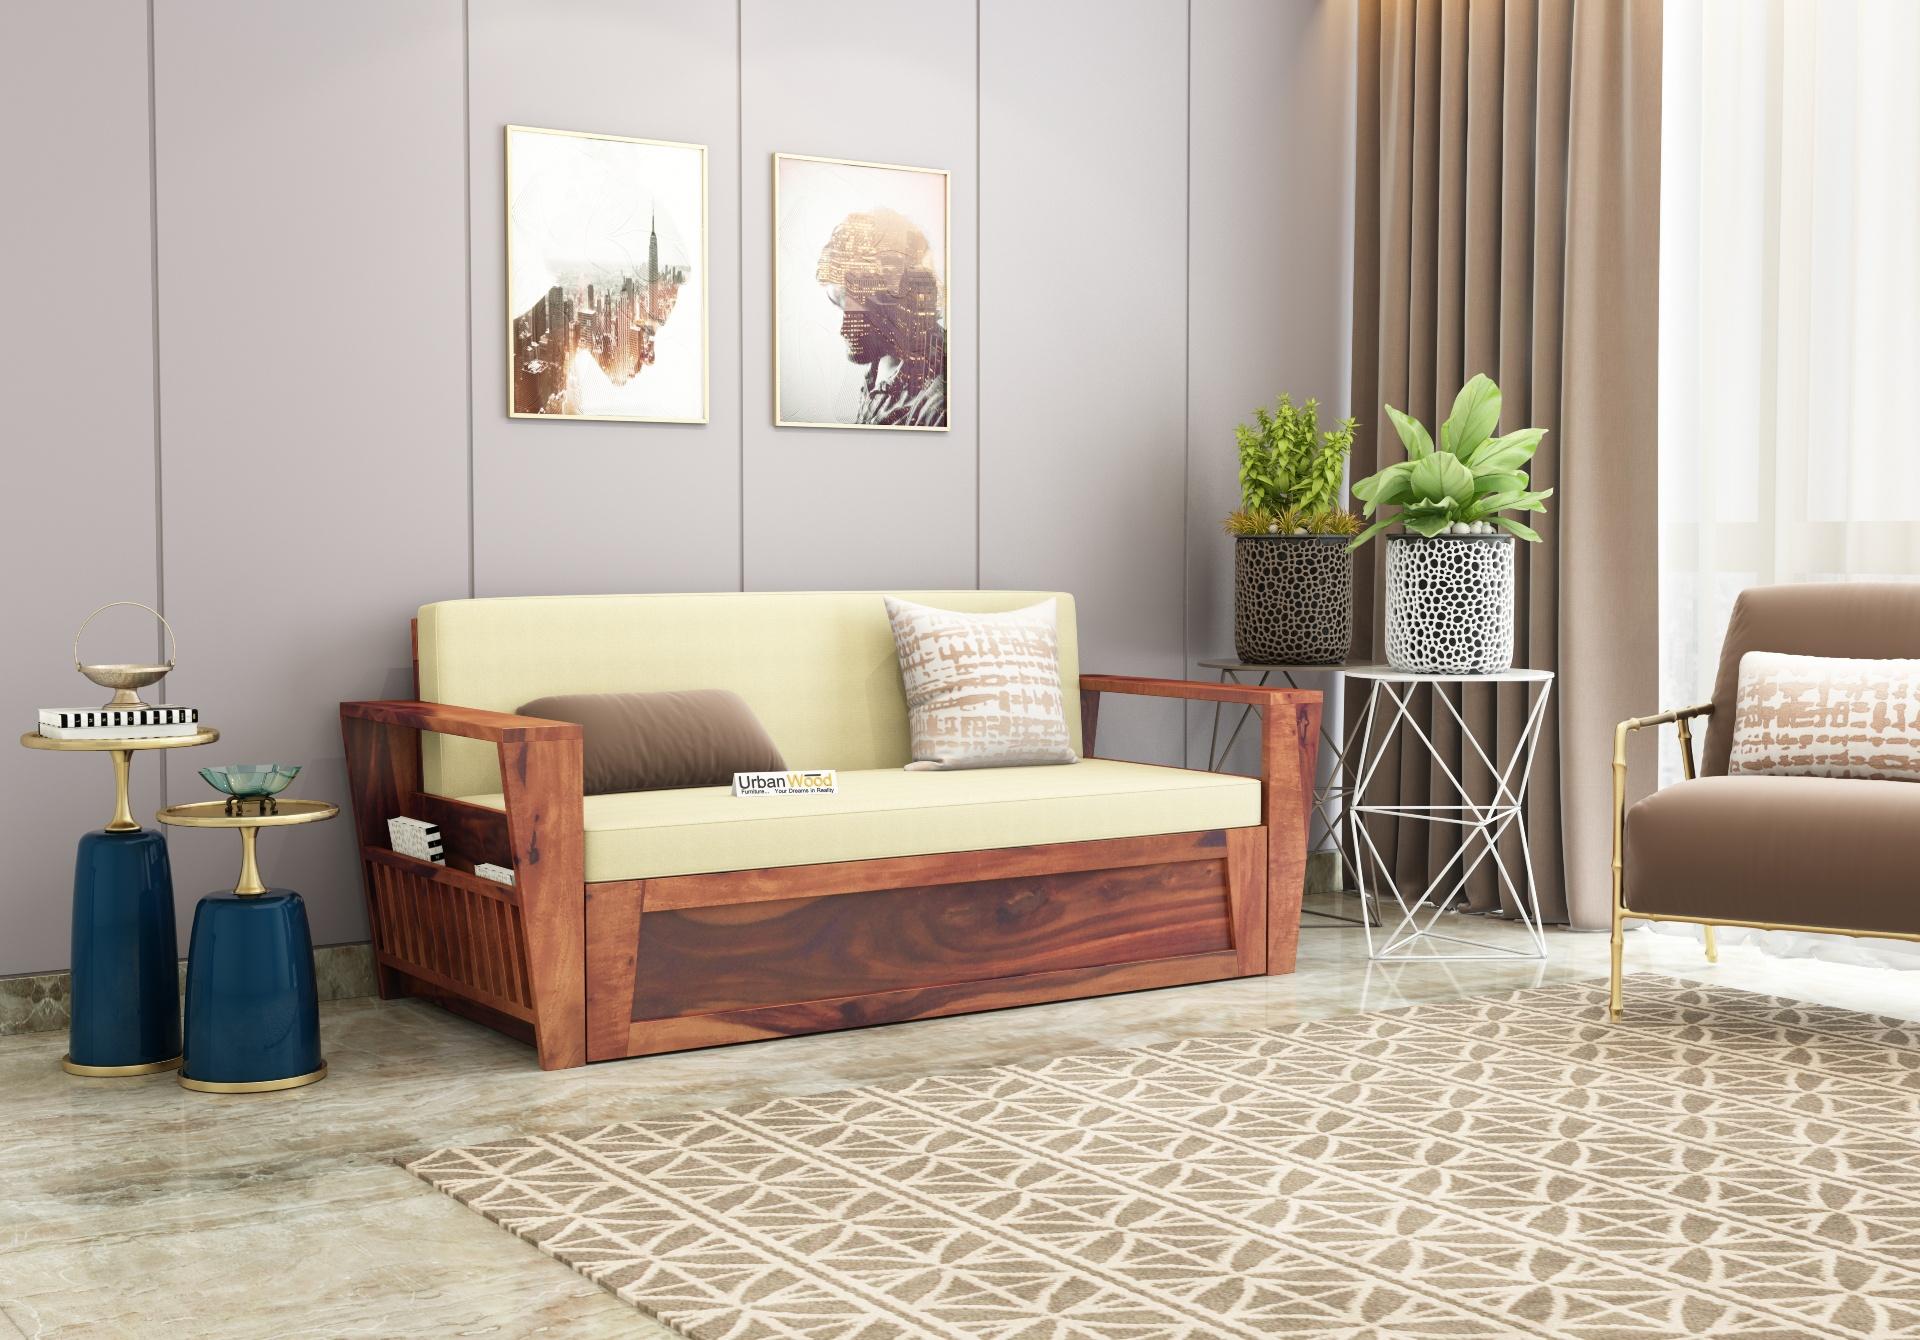 Bedex Sofa Cum Bed King Size <small>( Teak Finish )</small>